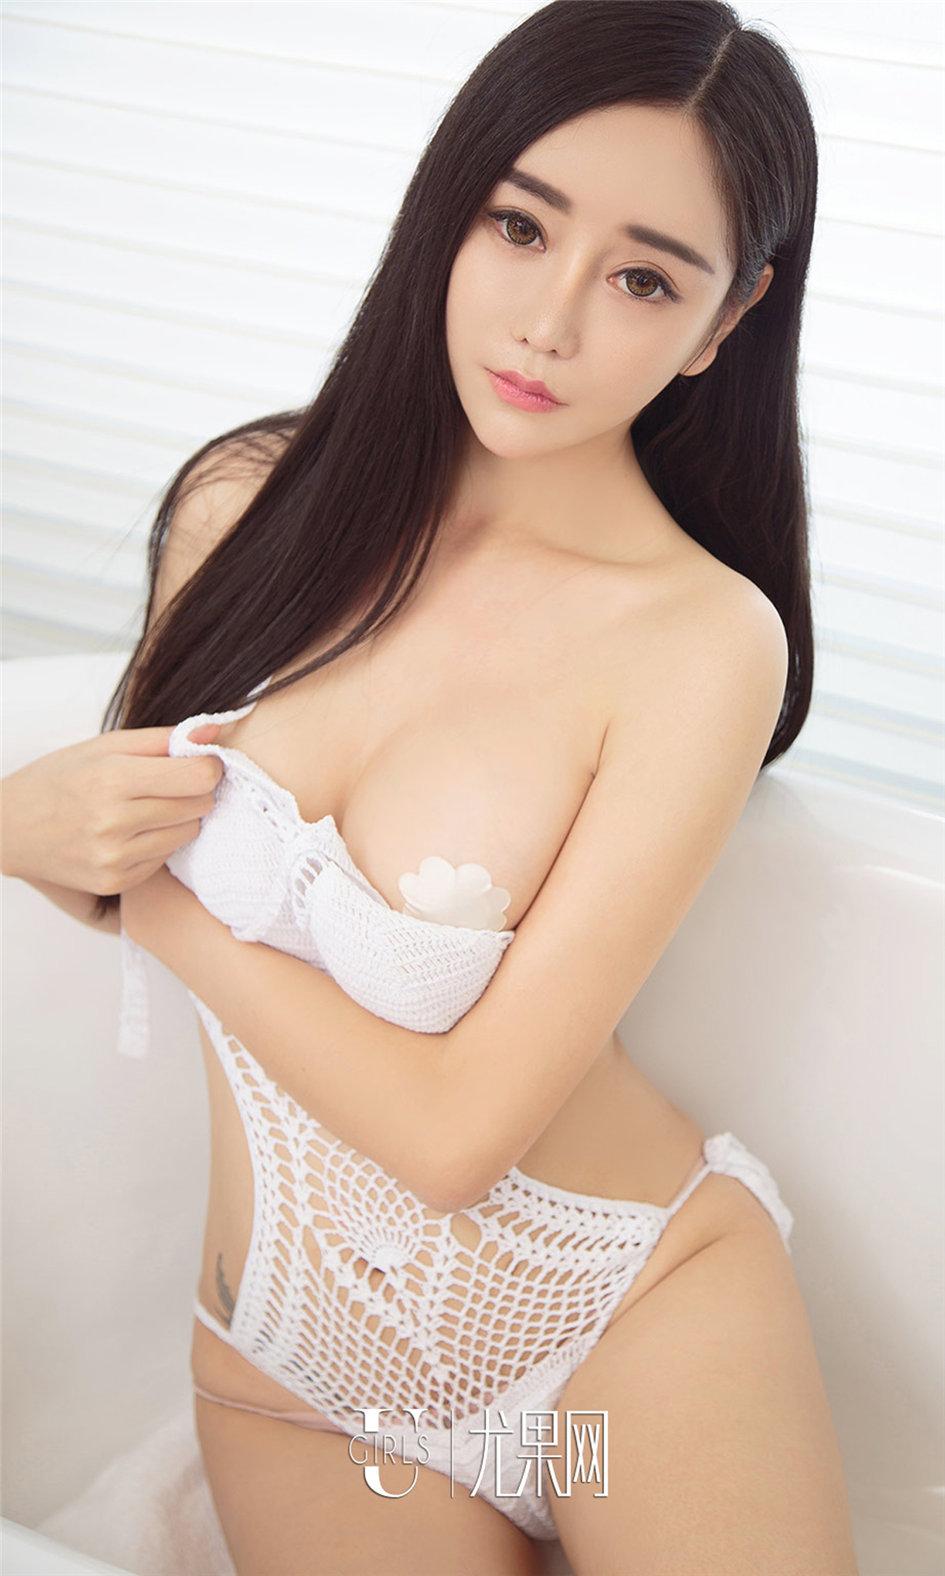 [ugirls尤果网] 清纯气质养眼美女Yina诱人写真照片